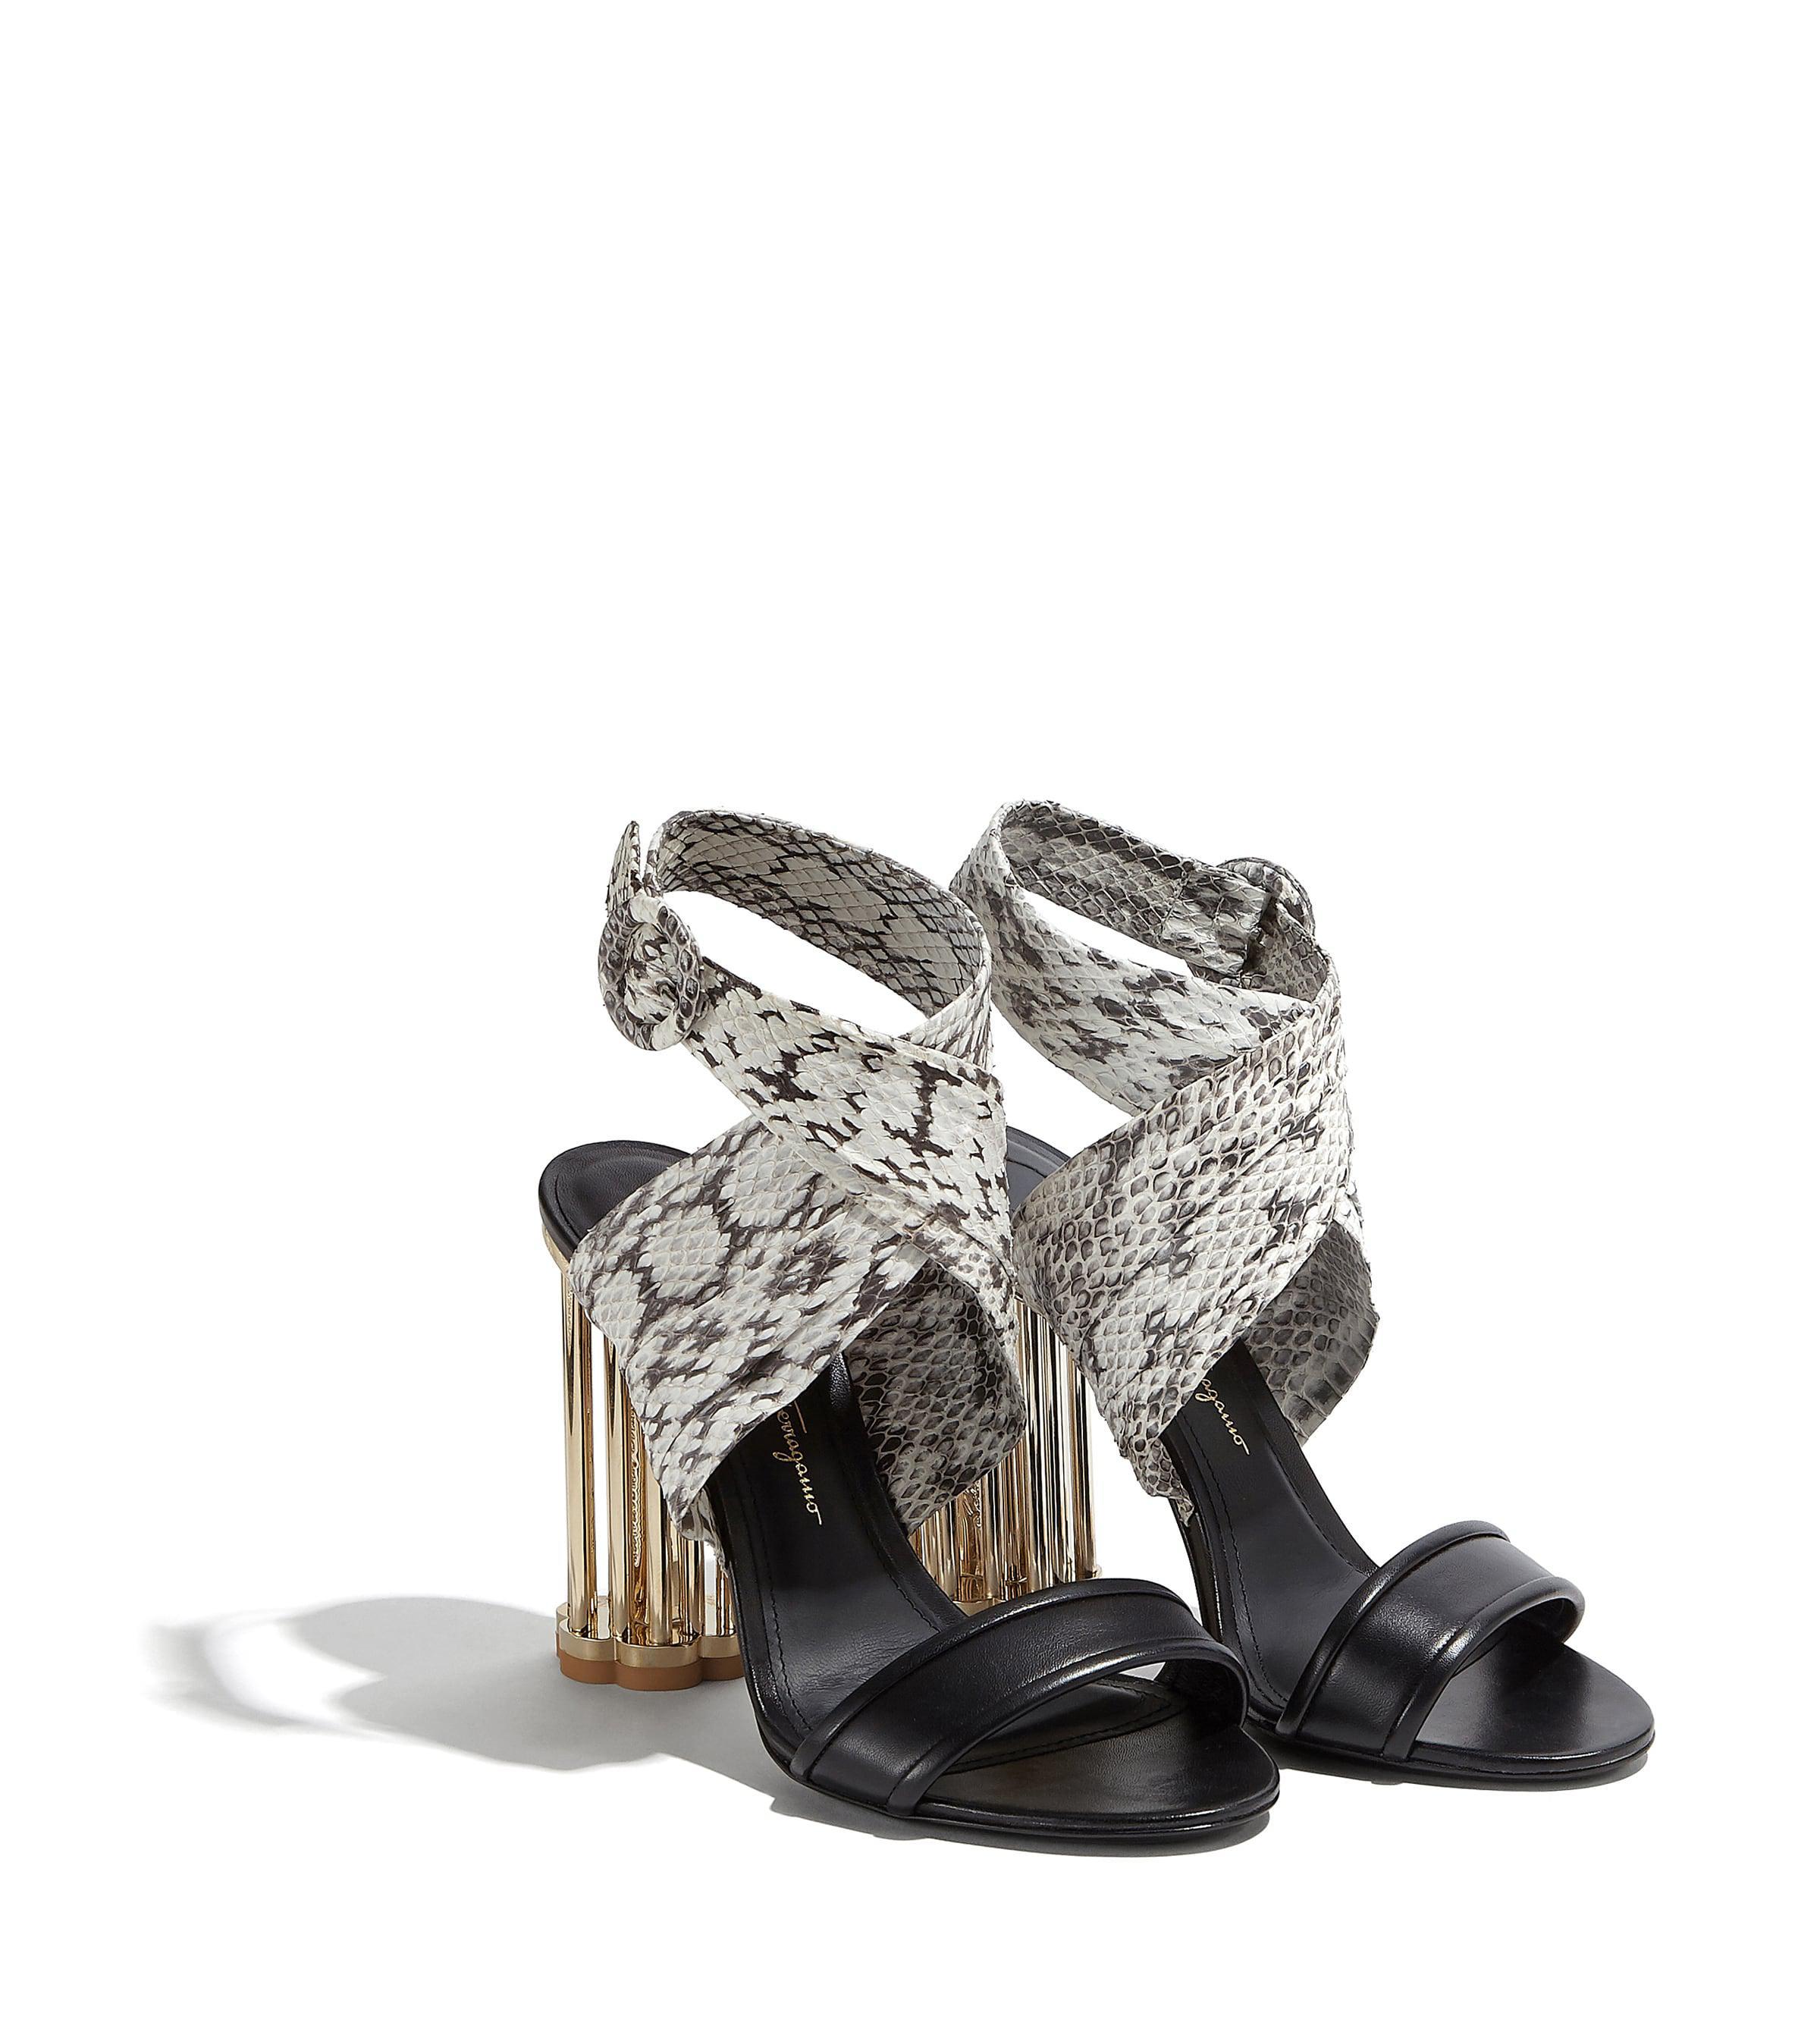 43c7dea09c01 Lyst - Ferragamo Criss-cross Sandal With Cage Flower Heel in Black